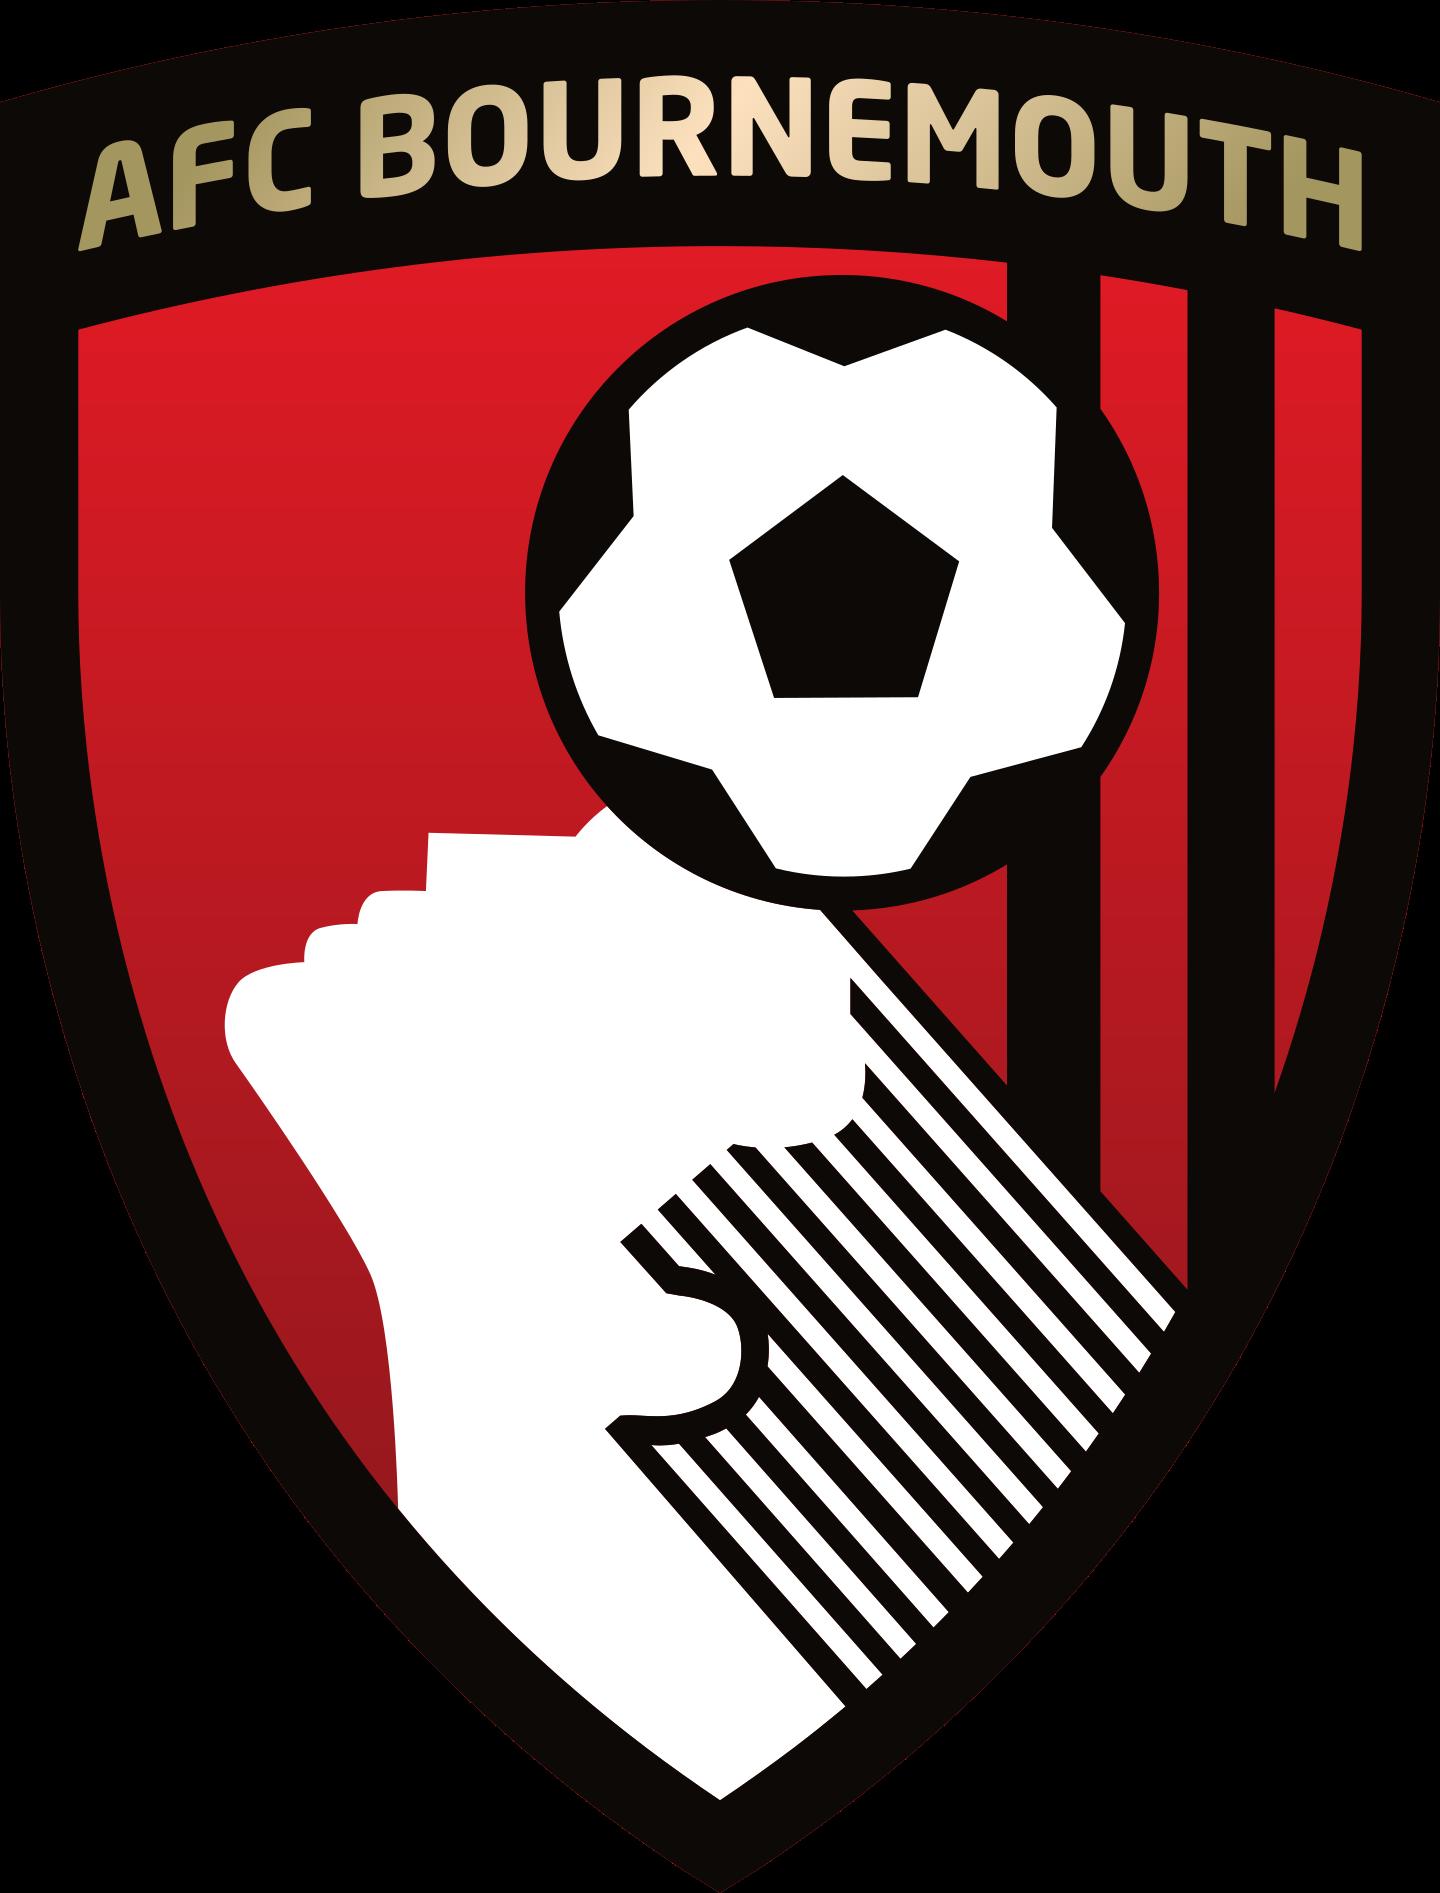 bournemouth fc logo 2 - AFC Bournemouth Logo